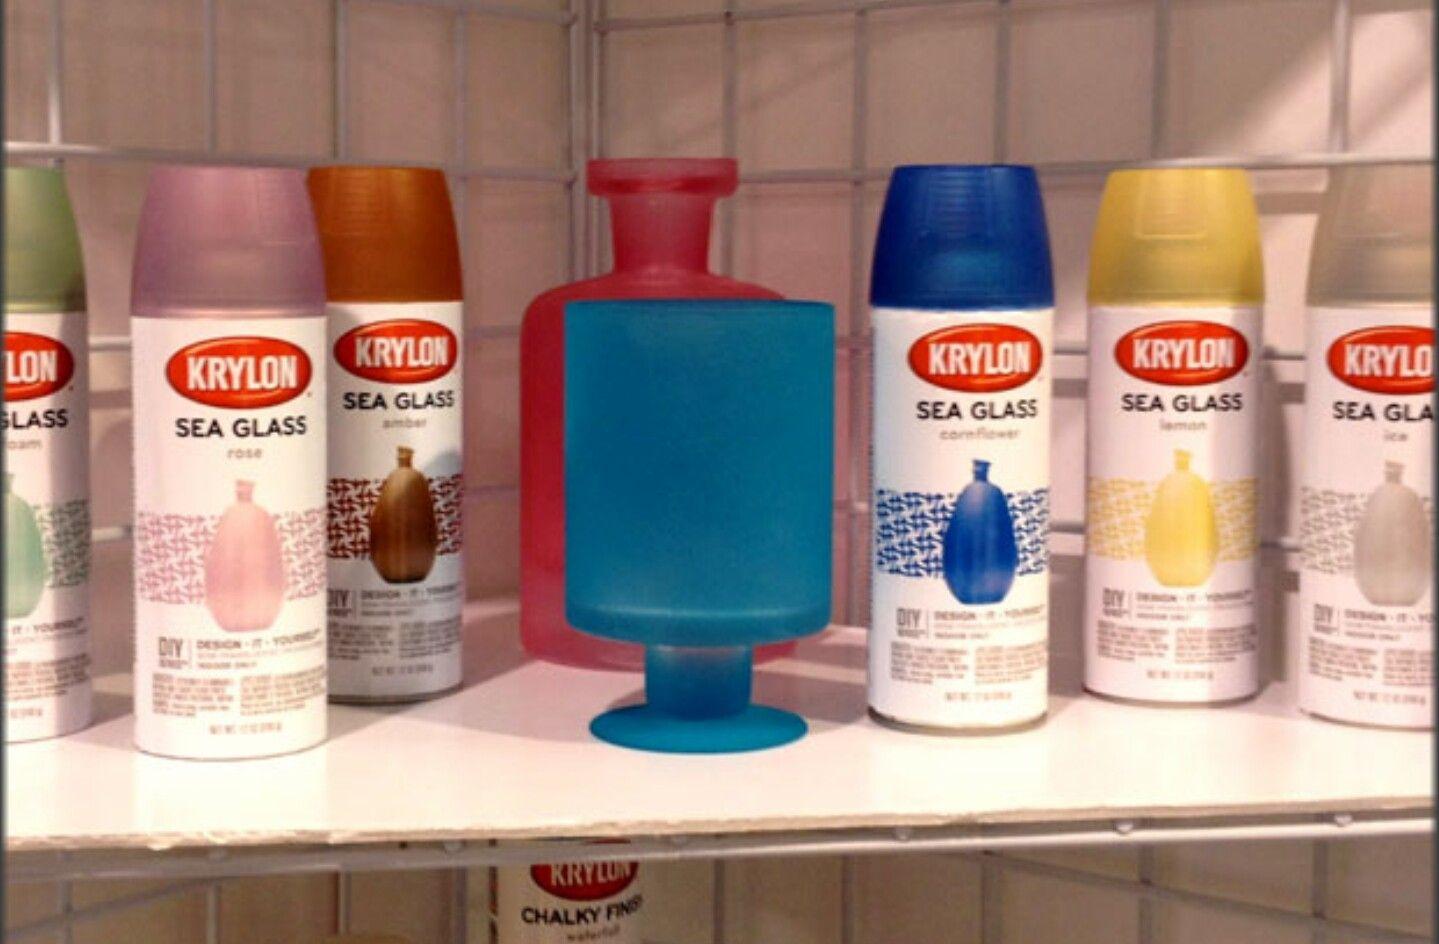 Krylon Sea Glass Paint Diy Glass Diy Spray Paint Seaglass